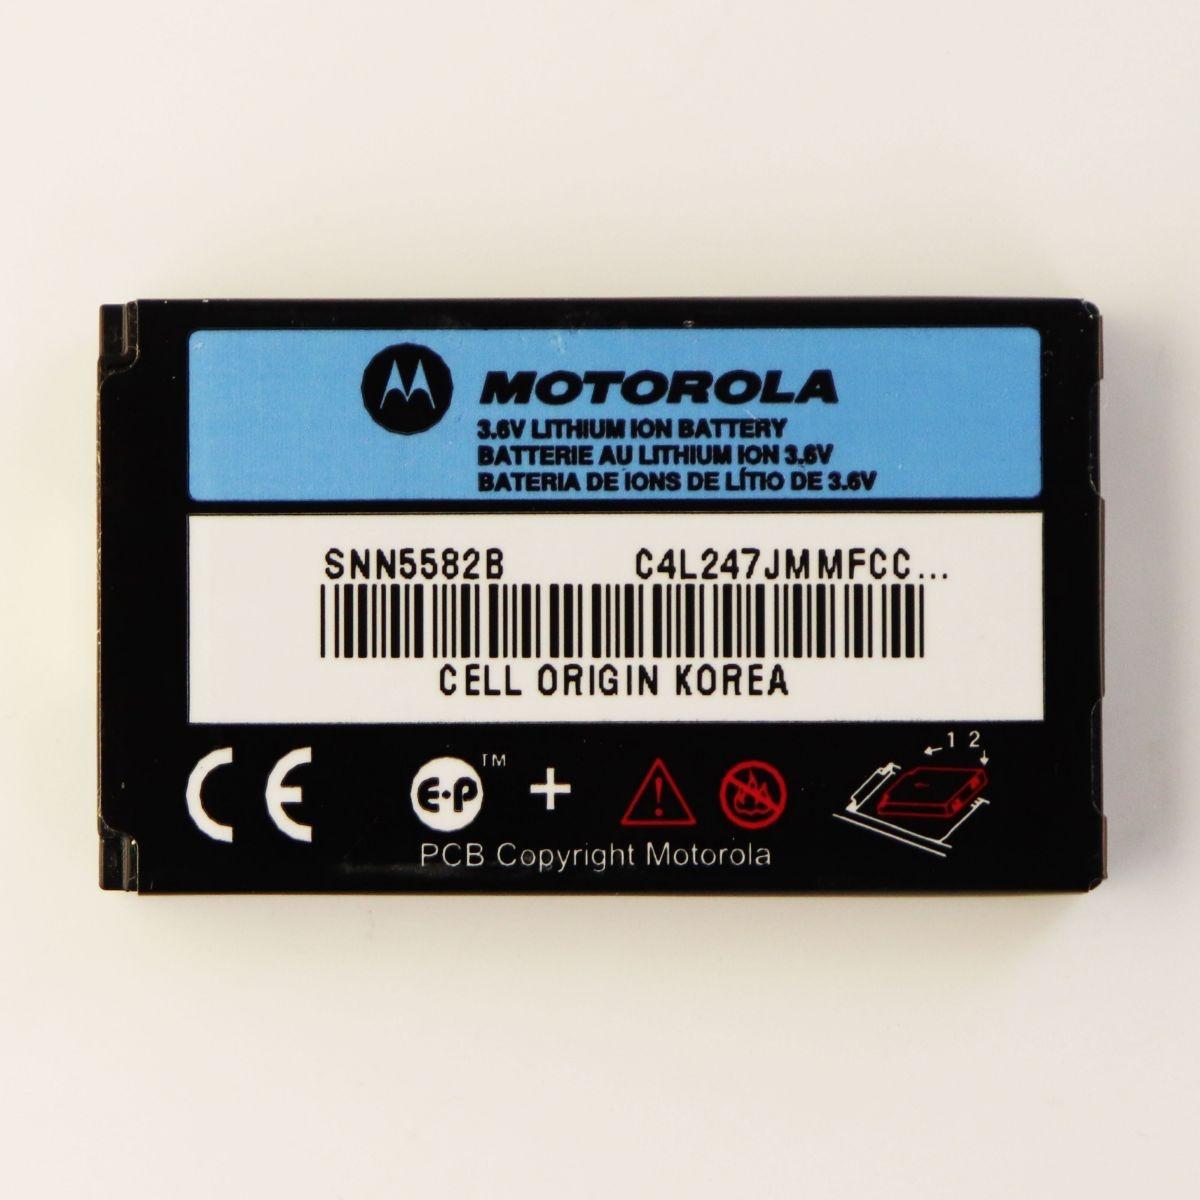 Motorola Li-ion Rechargeable Battery (SNN5582B) 3.6V for T730 T720i T722i C300